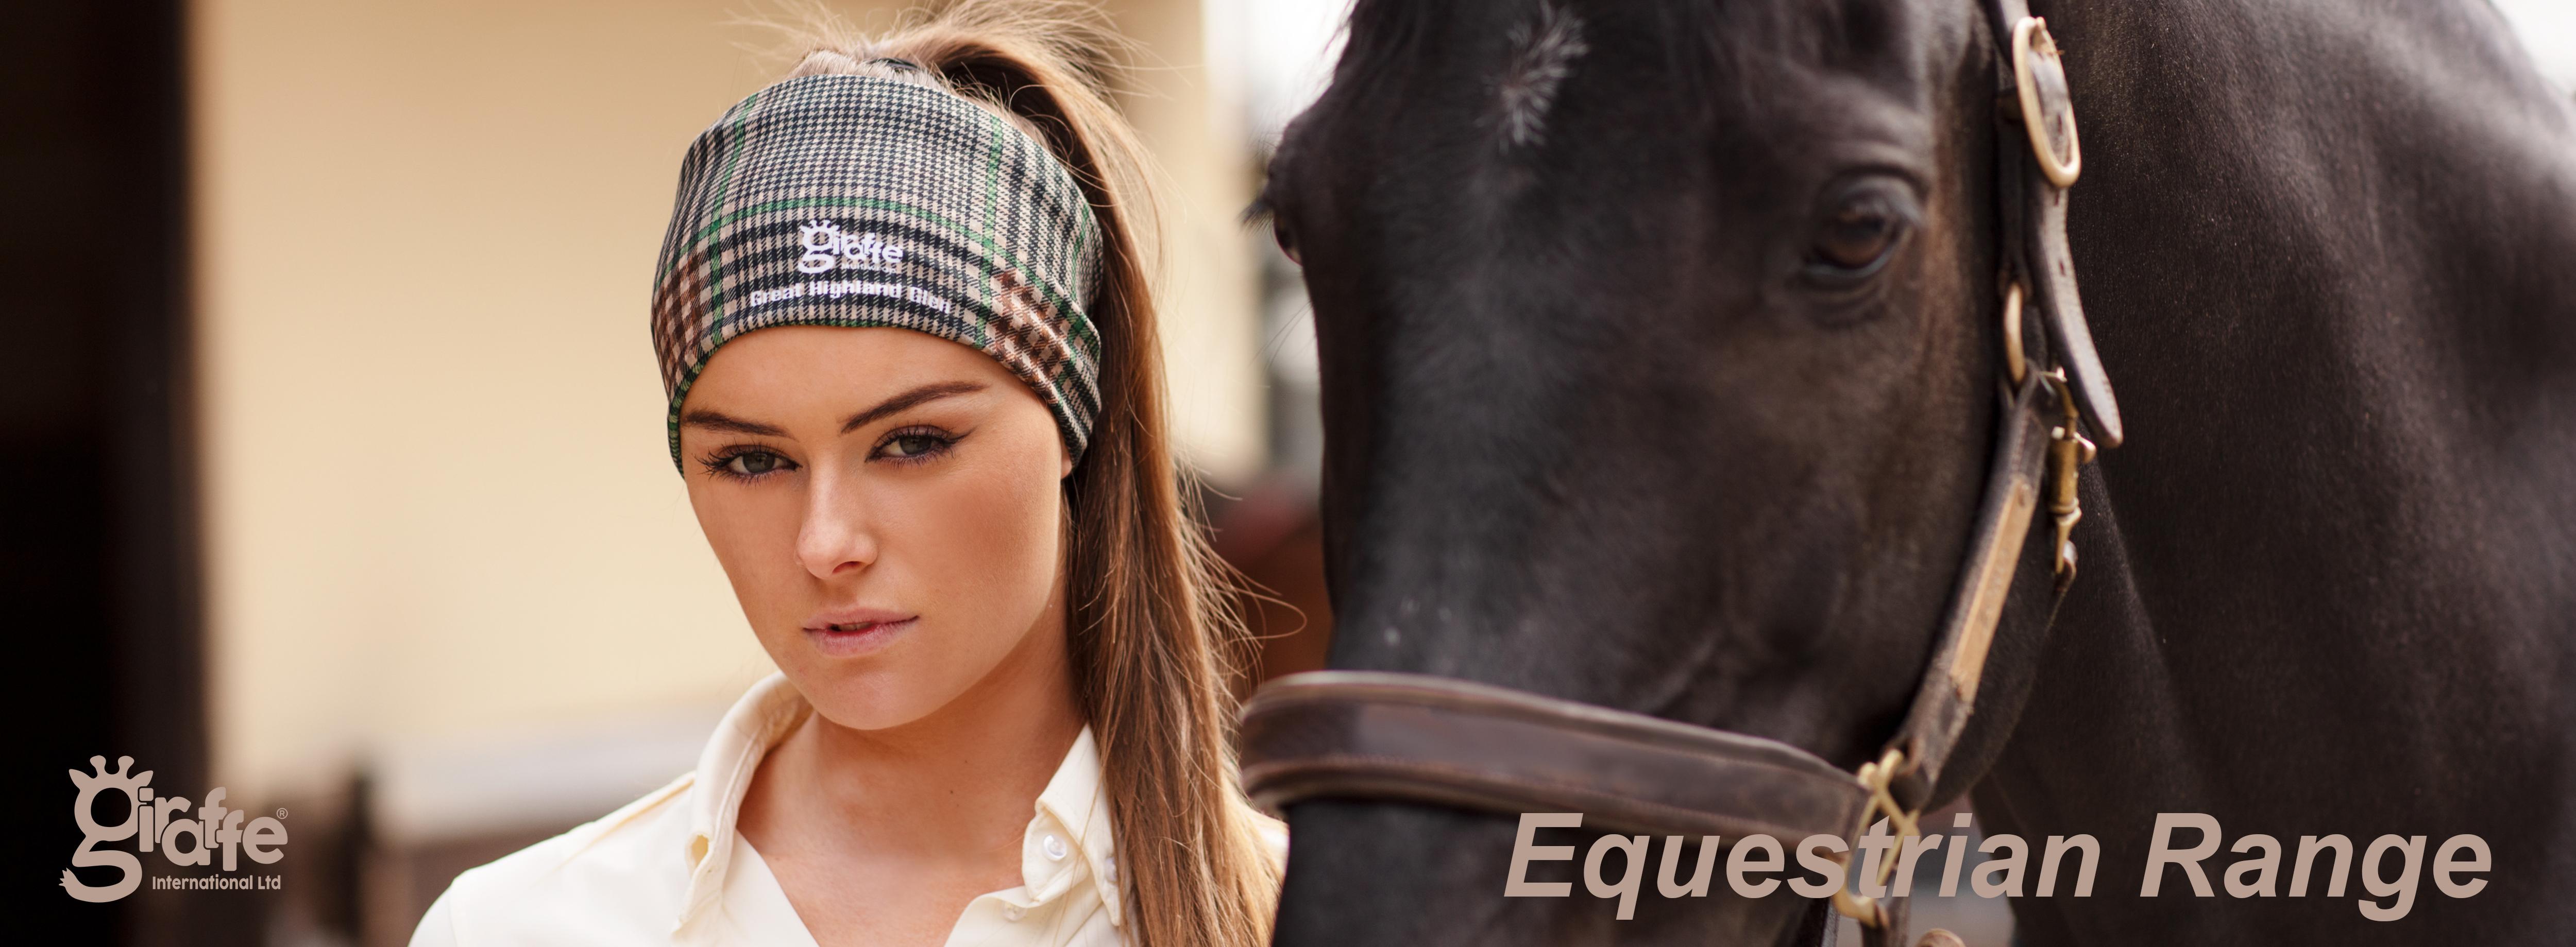 equestrian-page-header.jpg